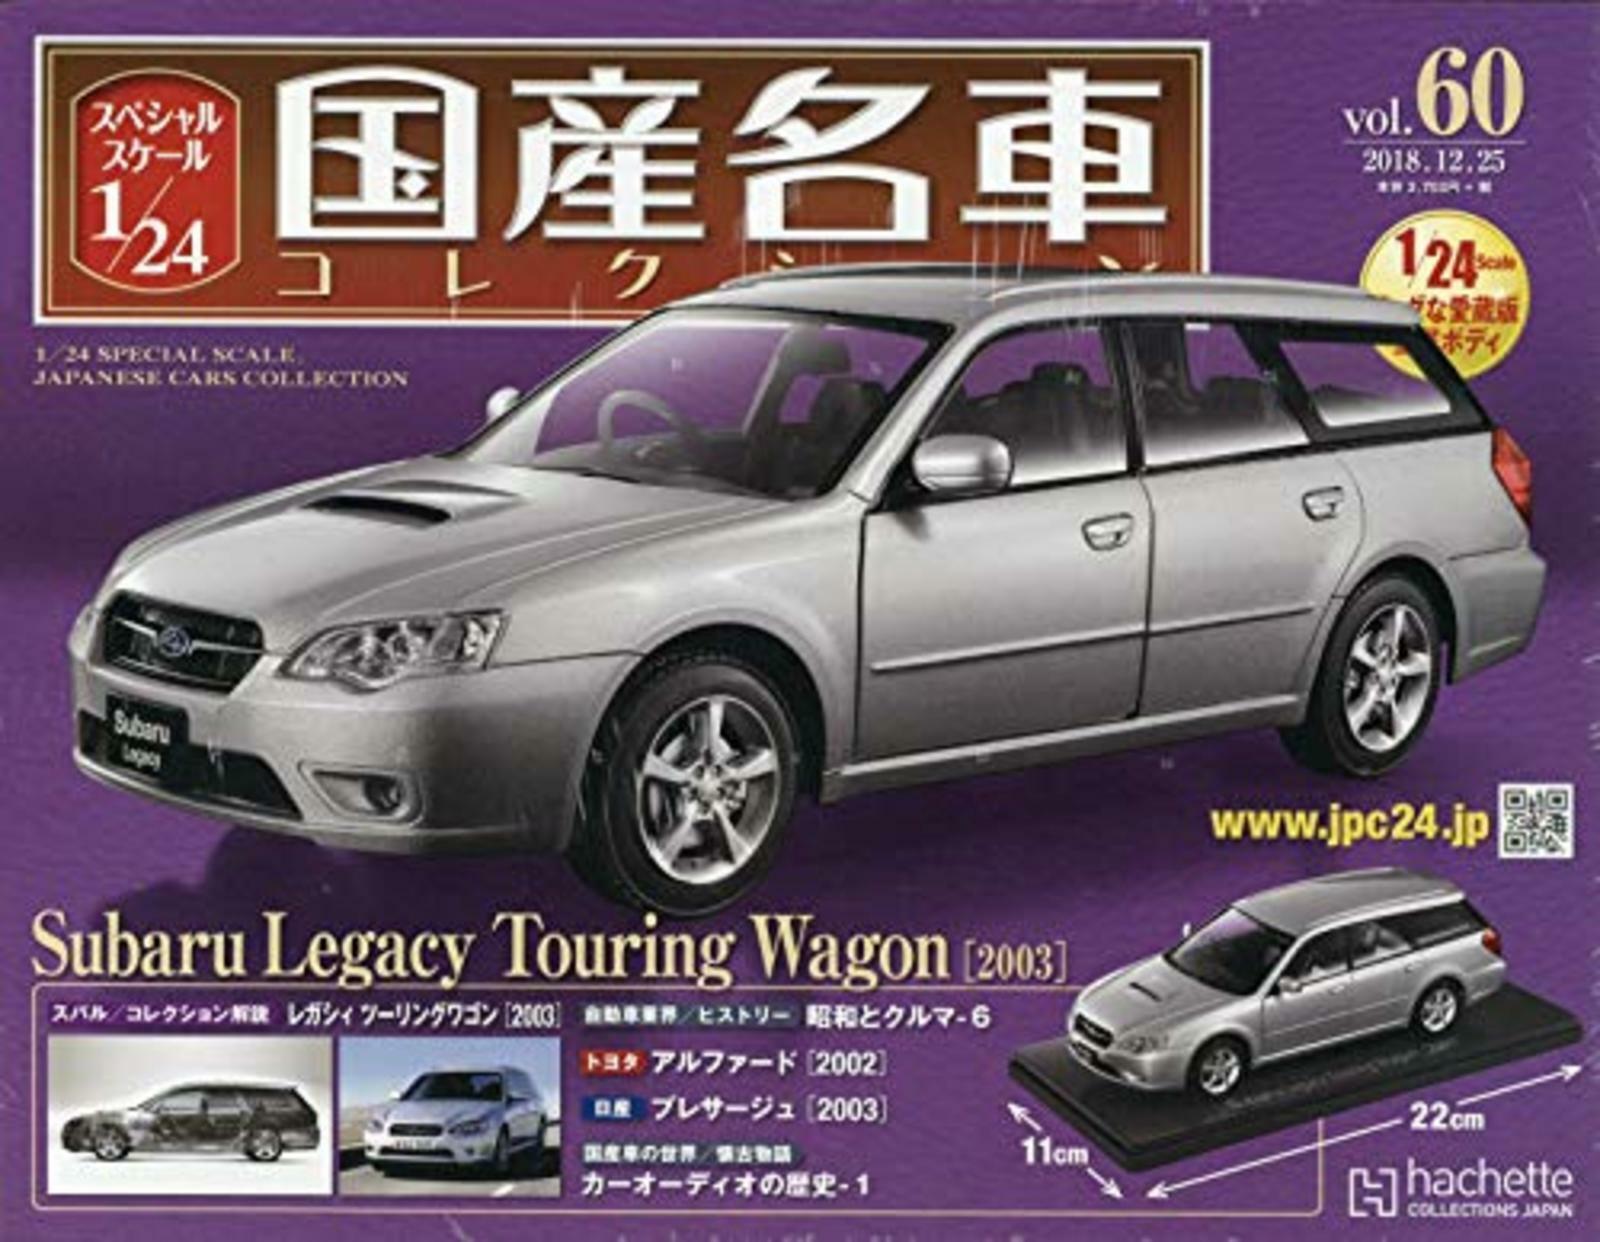 Hachette Subaru Legacy Touring Wagen (2003) 1 24 Modelauto Cars 60 F S Neu